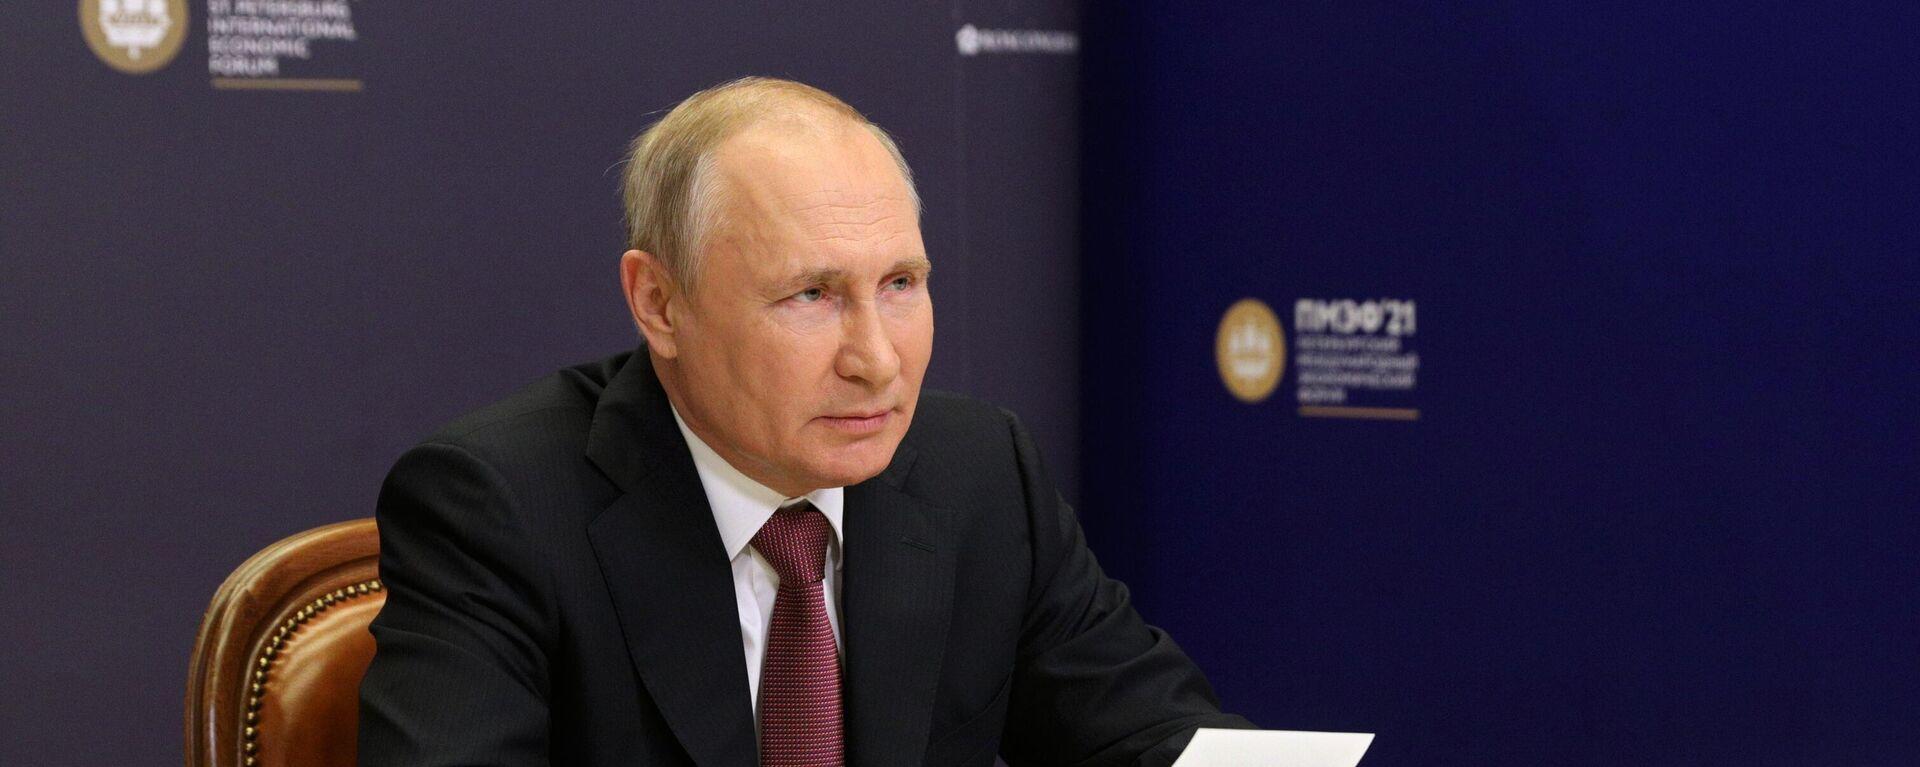 Vladímir Putin, presidente de Rusia, participa del Foro Económico de San Petersburgo - Sputnik Mundo, 1920, 04.06.2021